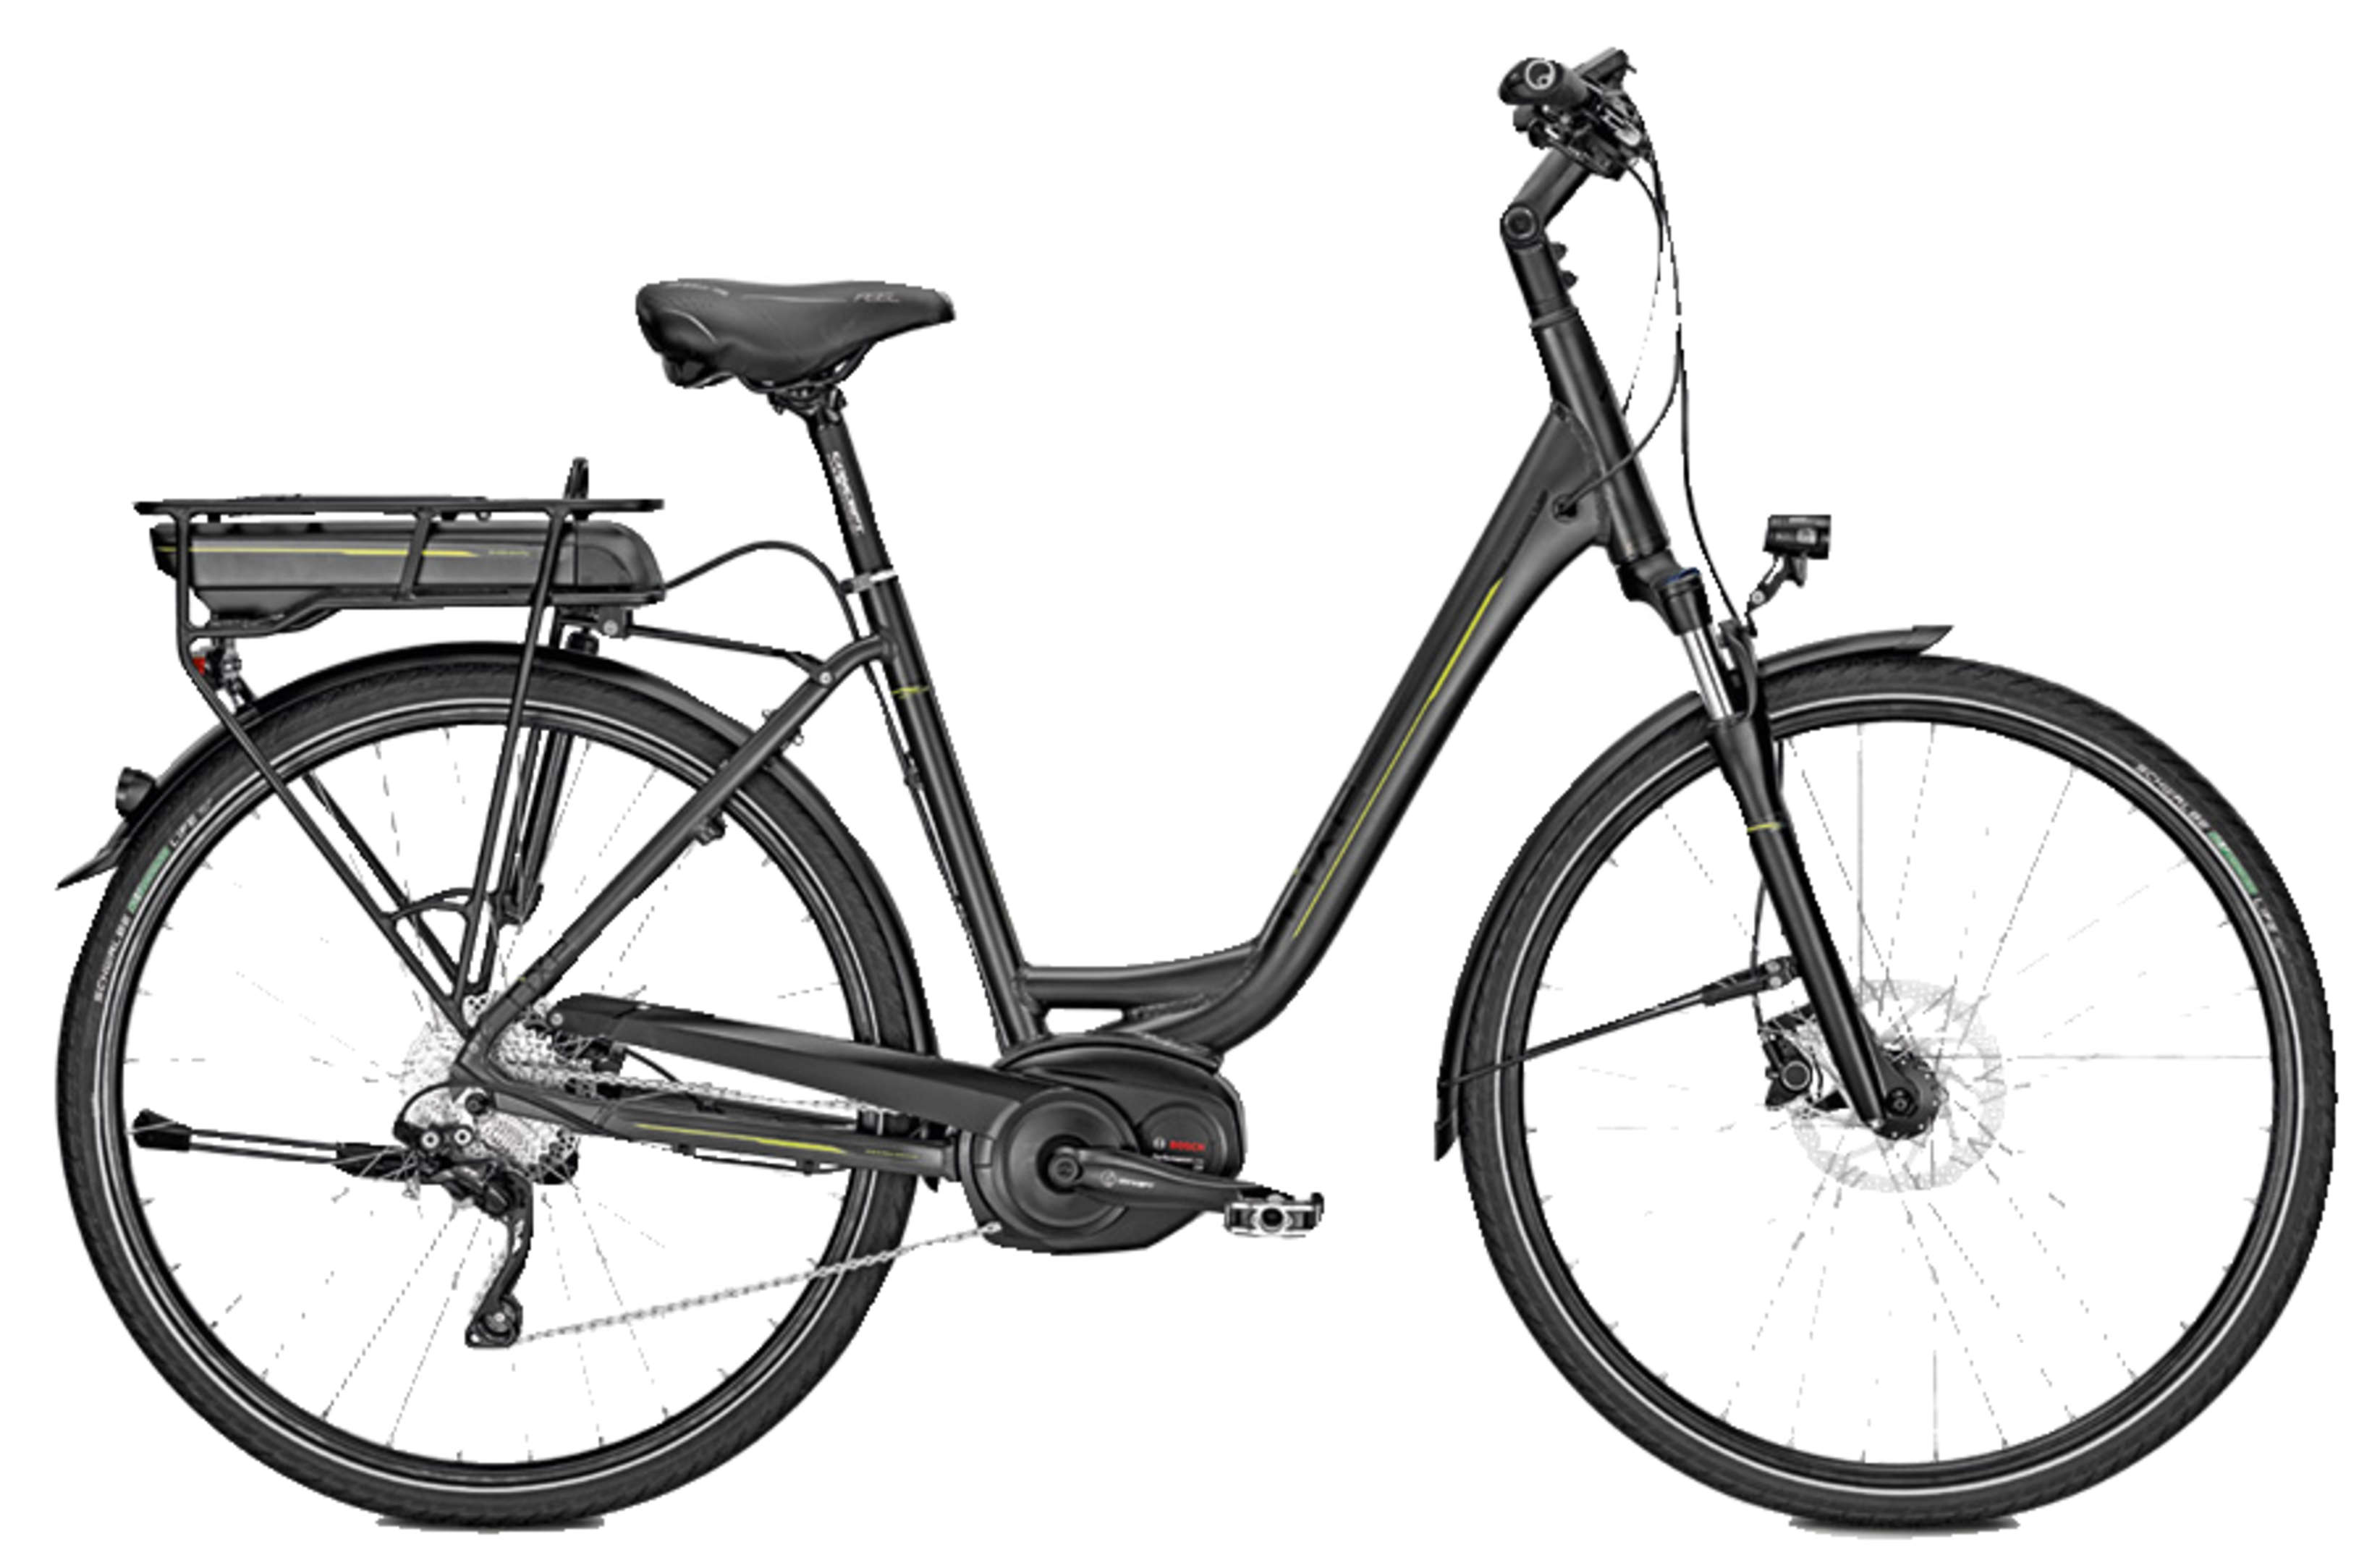 rixe e bike montpellier b10 eurorad bikeleasingeurorad. Black Bedroom Furniture Sets. Home Design Ideas